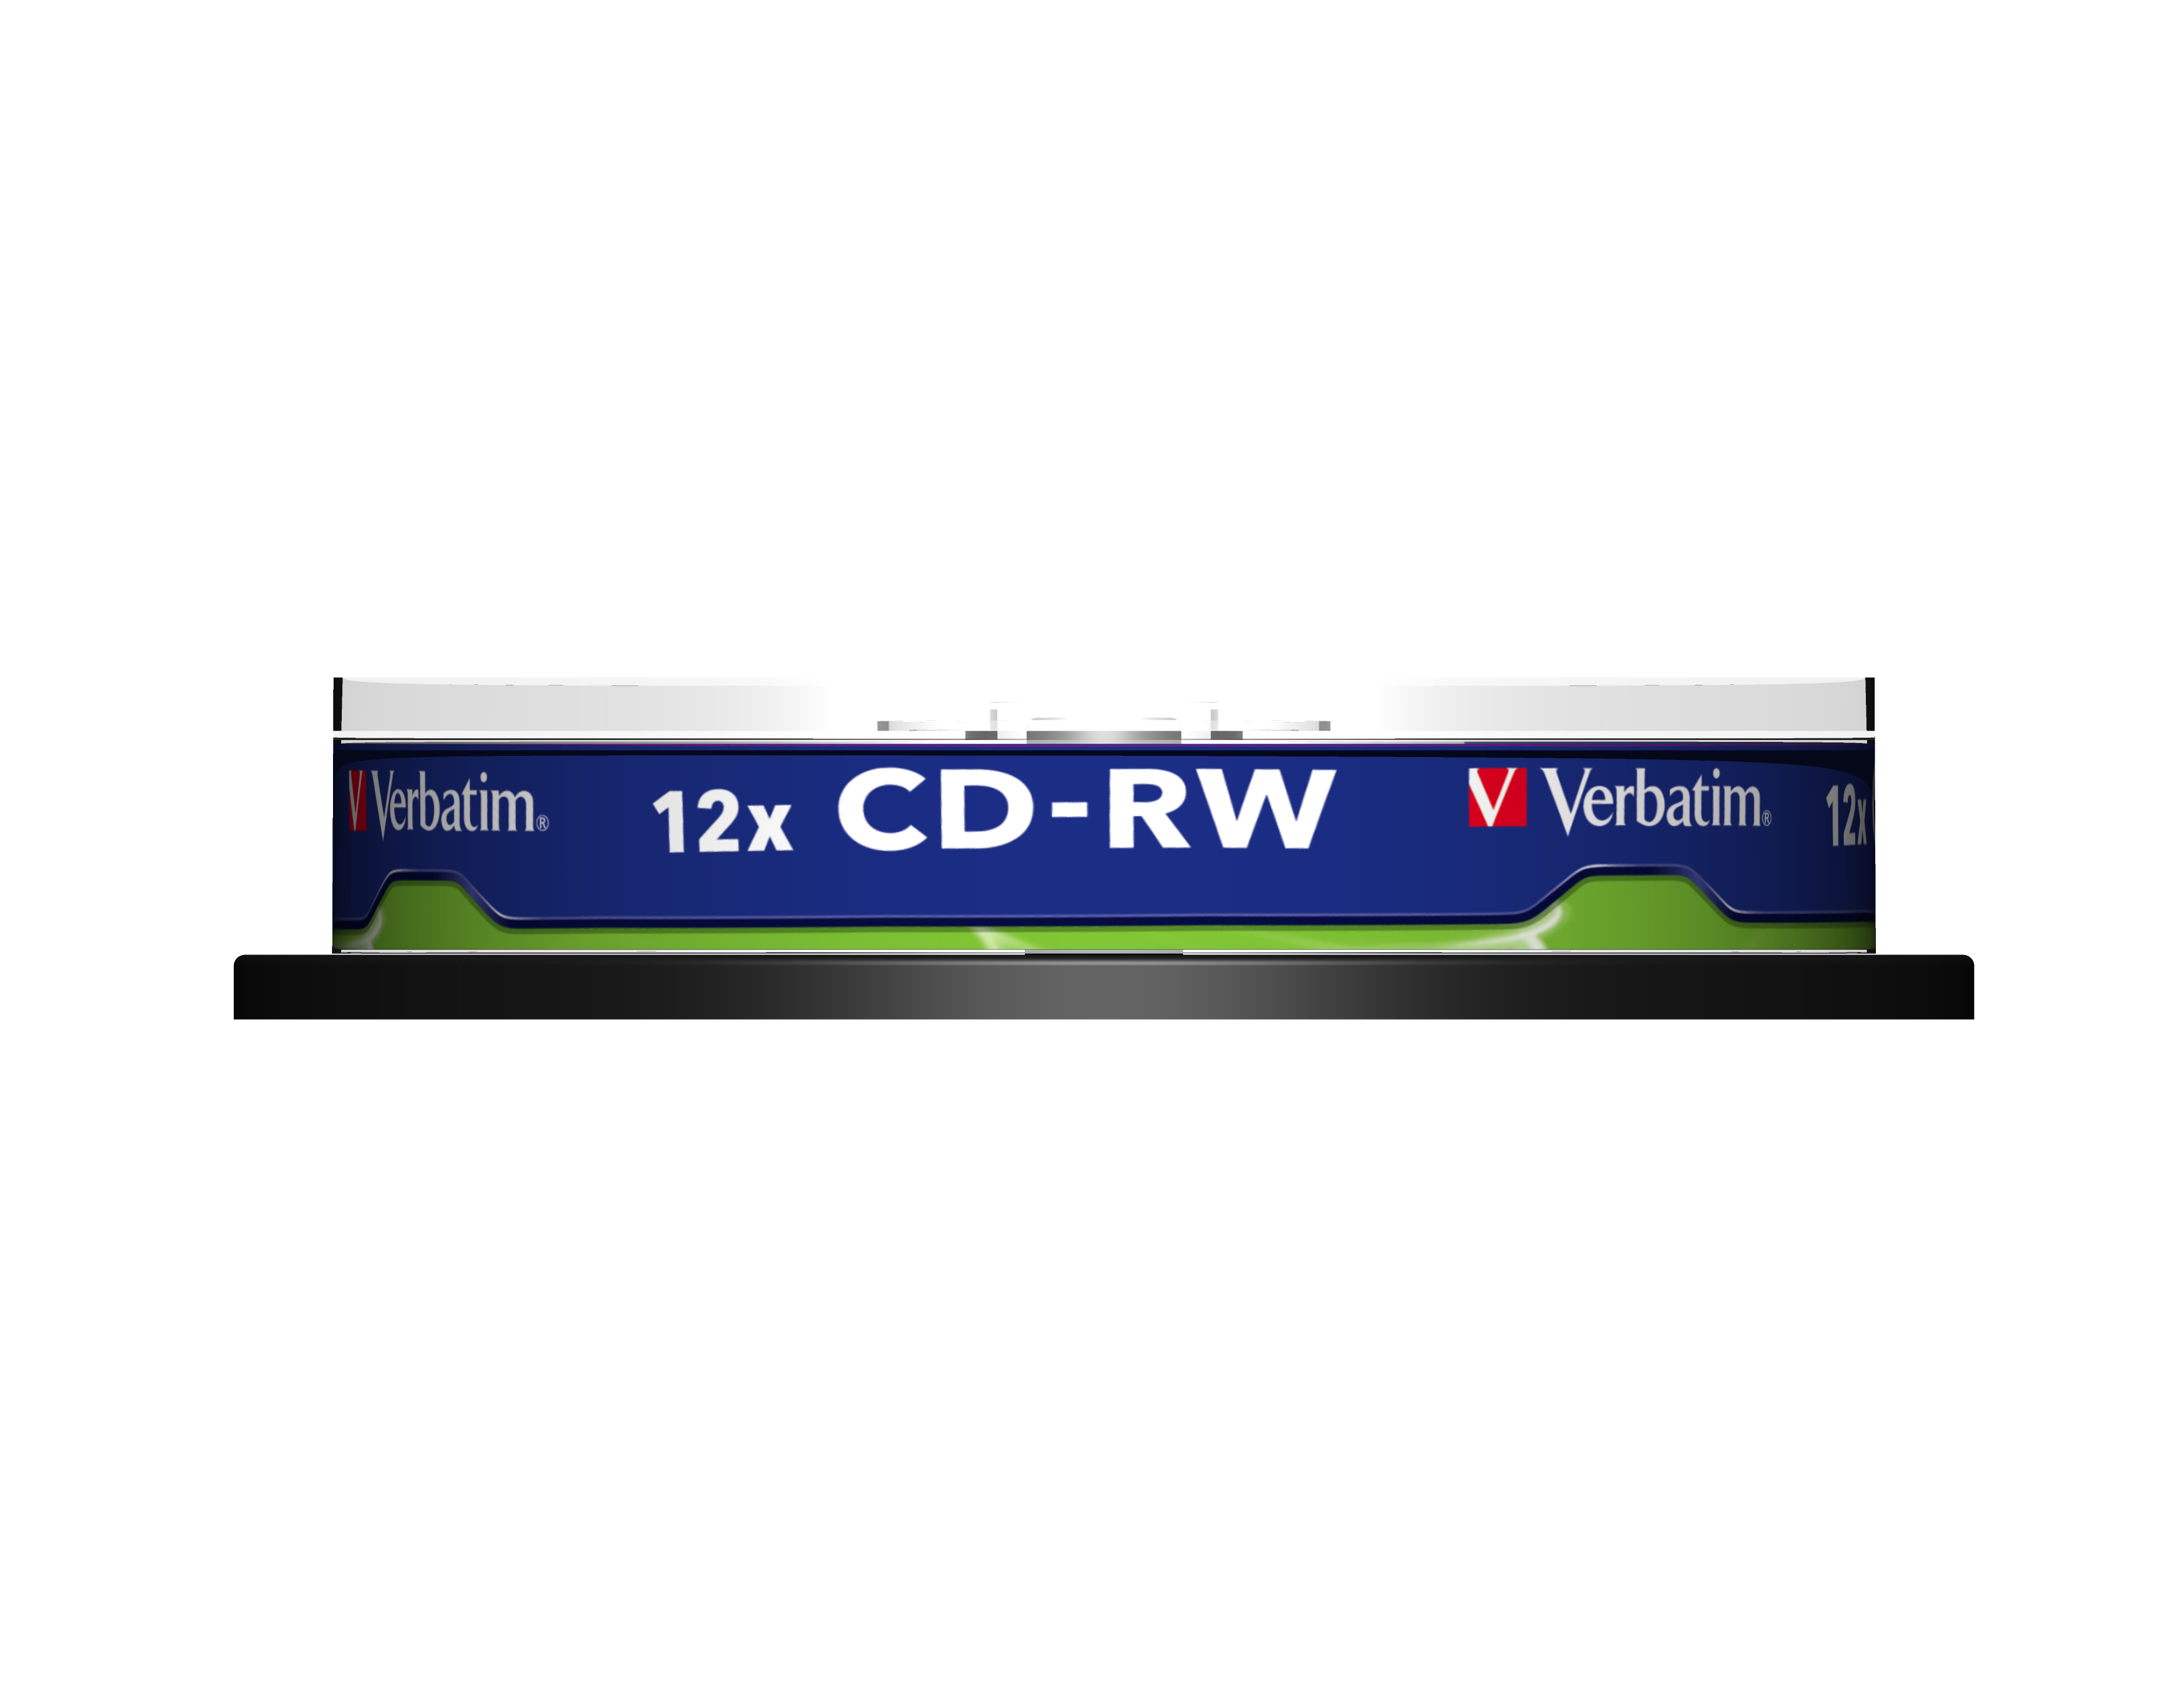 CD-RW 700 MB, 12 speed (10-pack jewelcase)